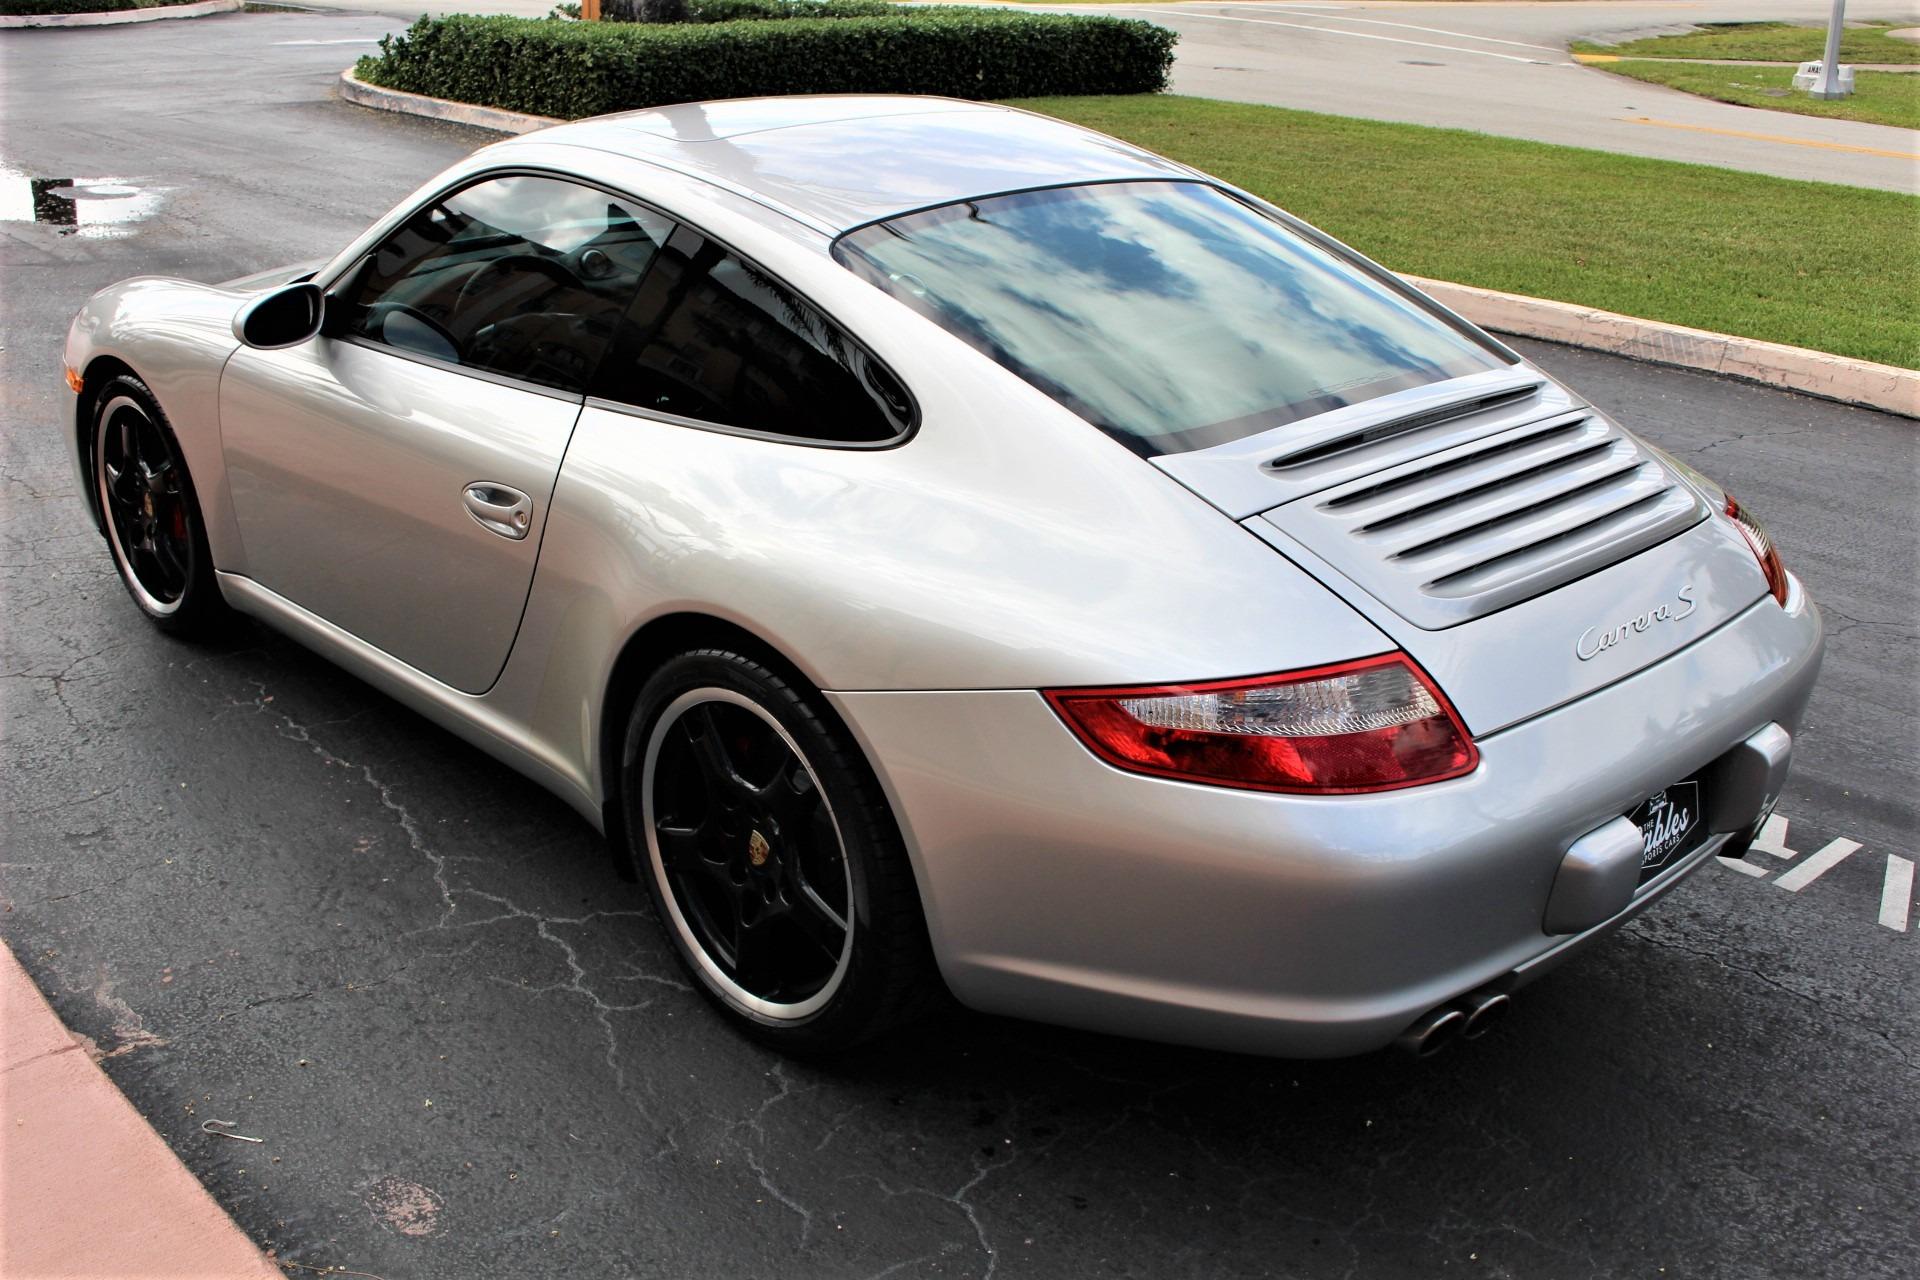 Used 2006 Porsche 911 Carrera S for sale $49,850 at The Gables Sports Cars in Miami FL 33146 2